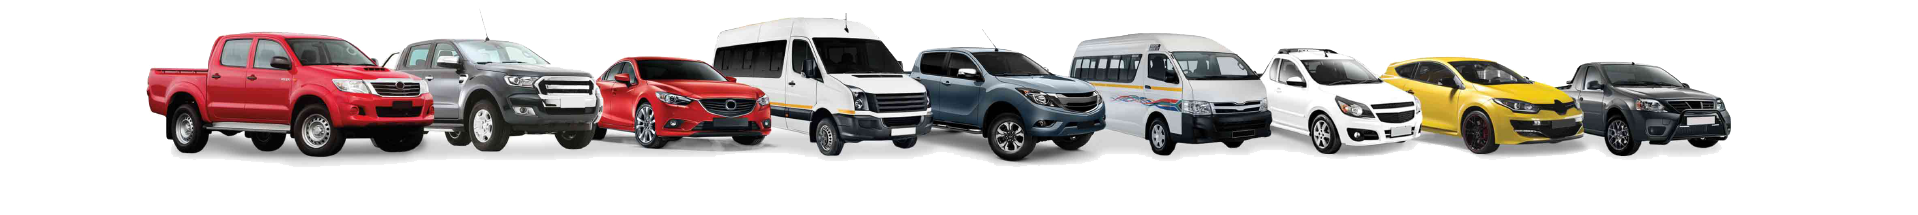 Goldwagen Port Elizabeth – Vehicle Parts and Spares